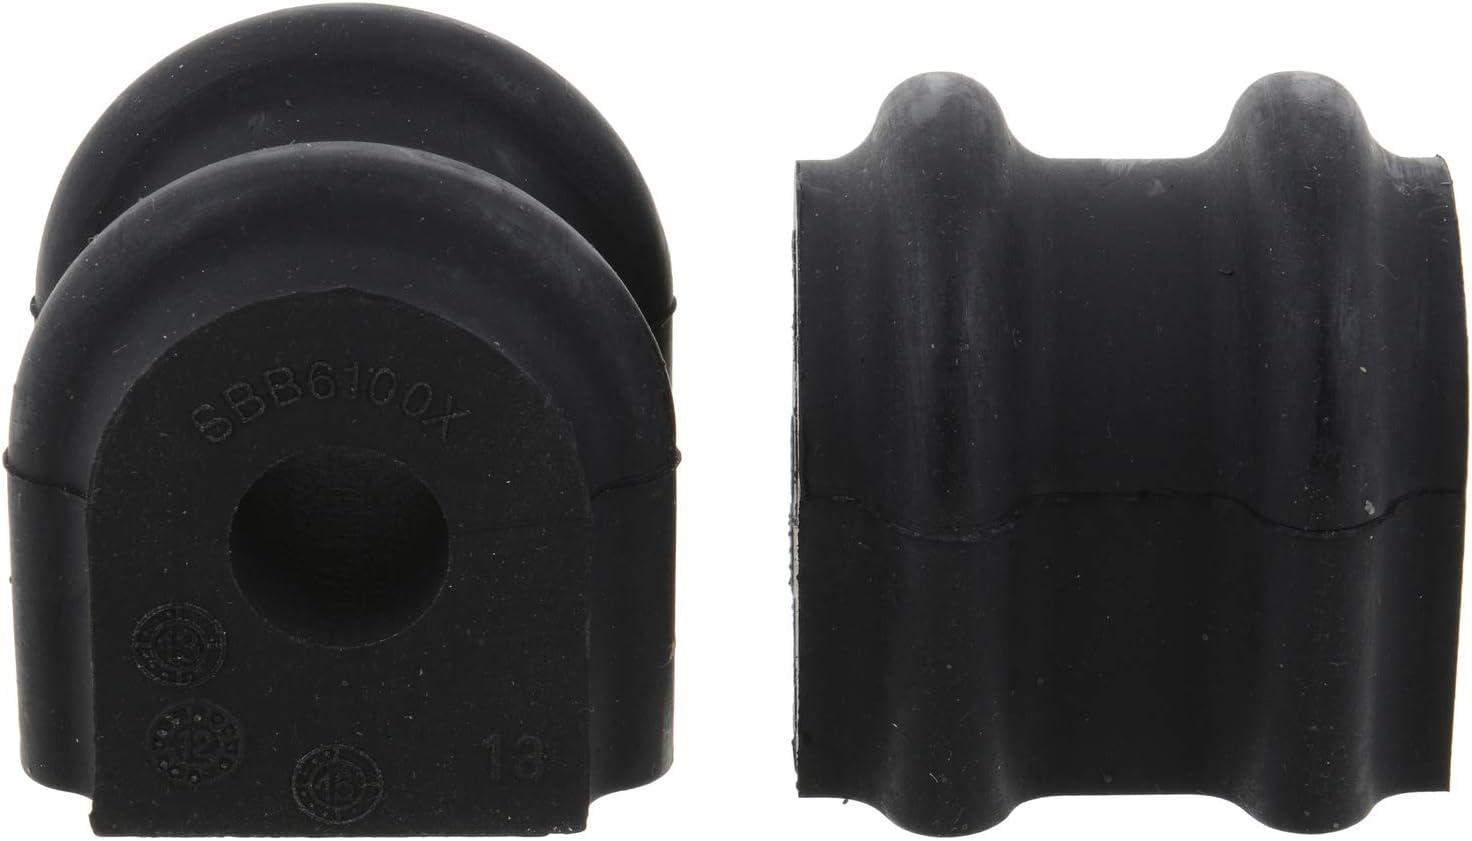 TRW JBU1783 Suspension Stabilizer Bar Bushing Kit for Hyundai Sonata 2006-2007 and other applications Rear To Frame